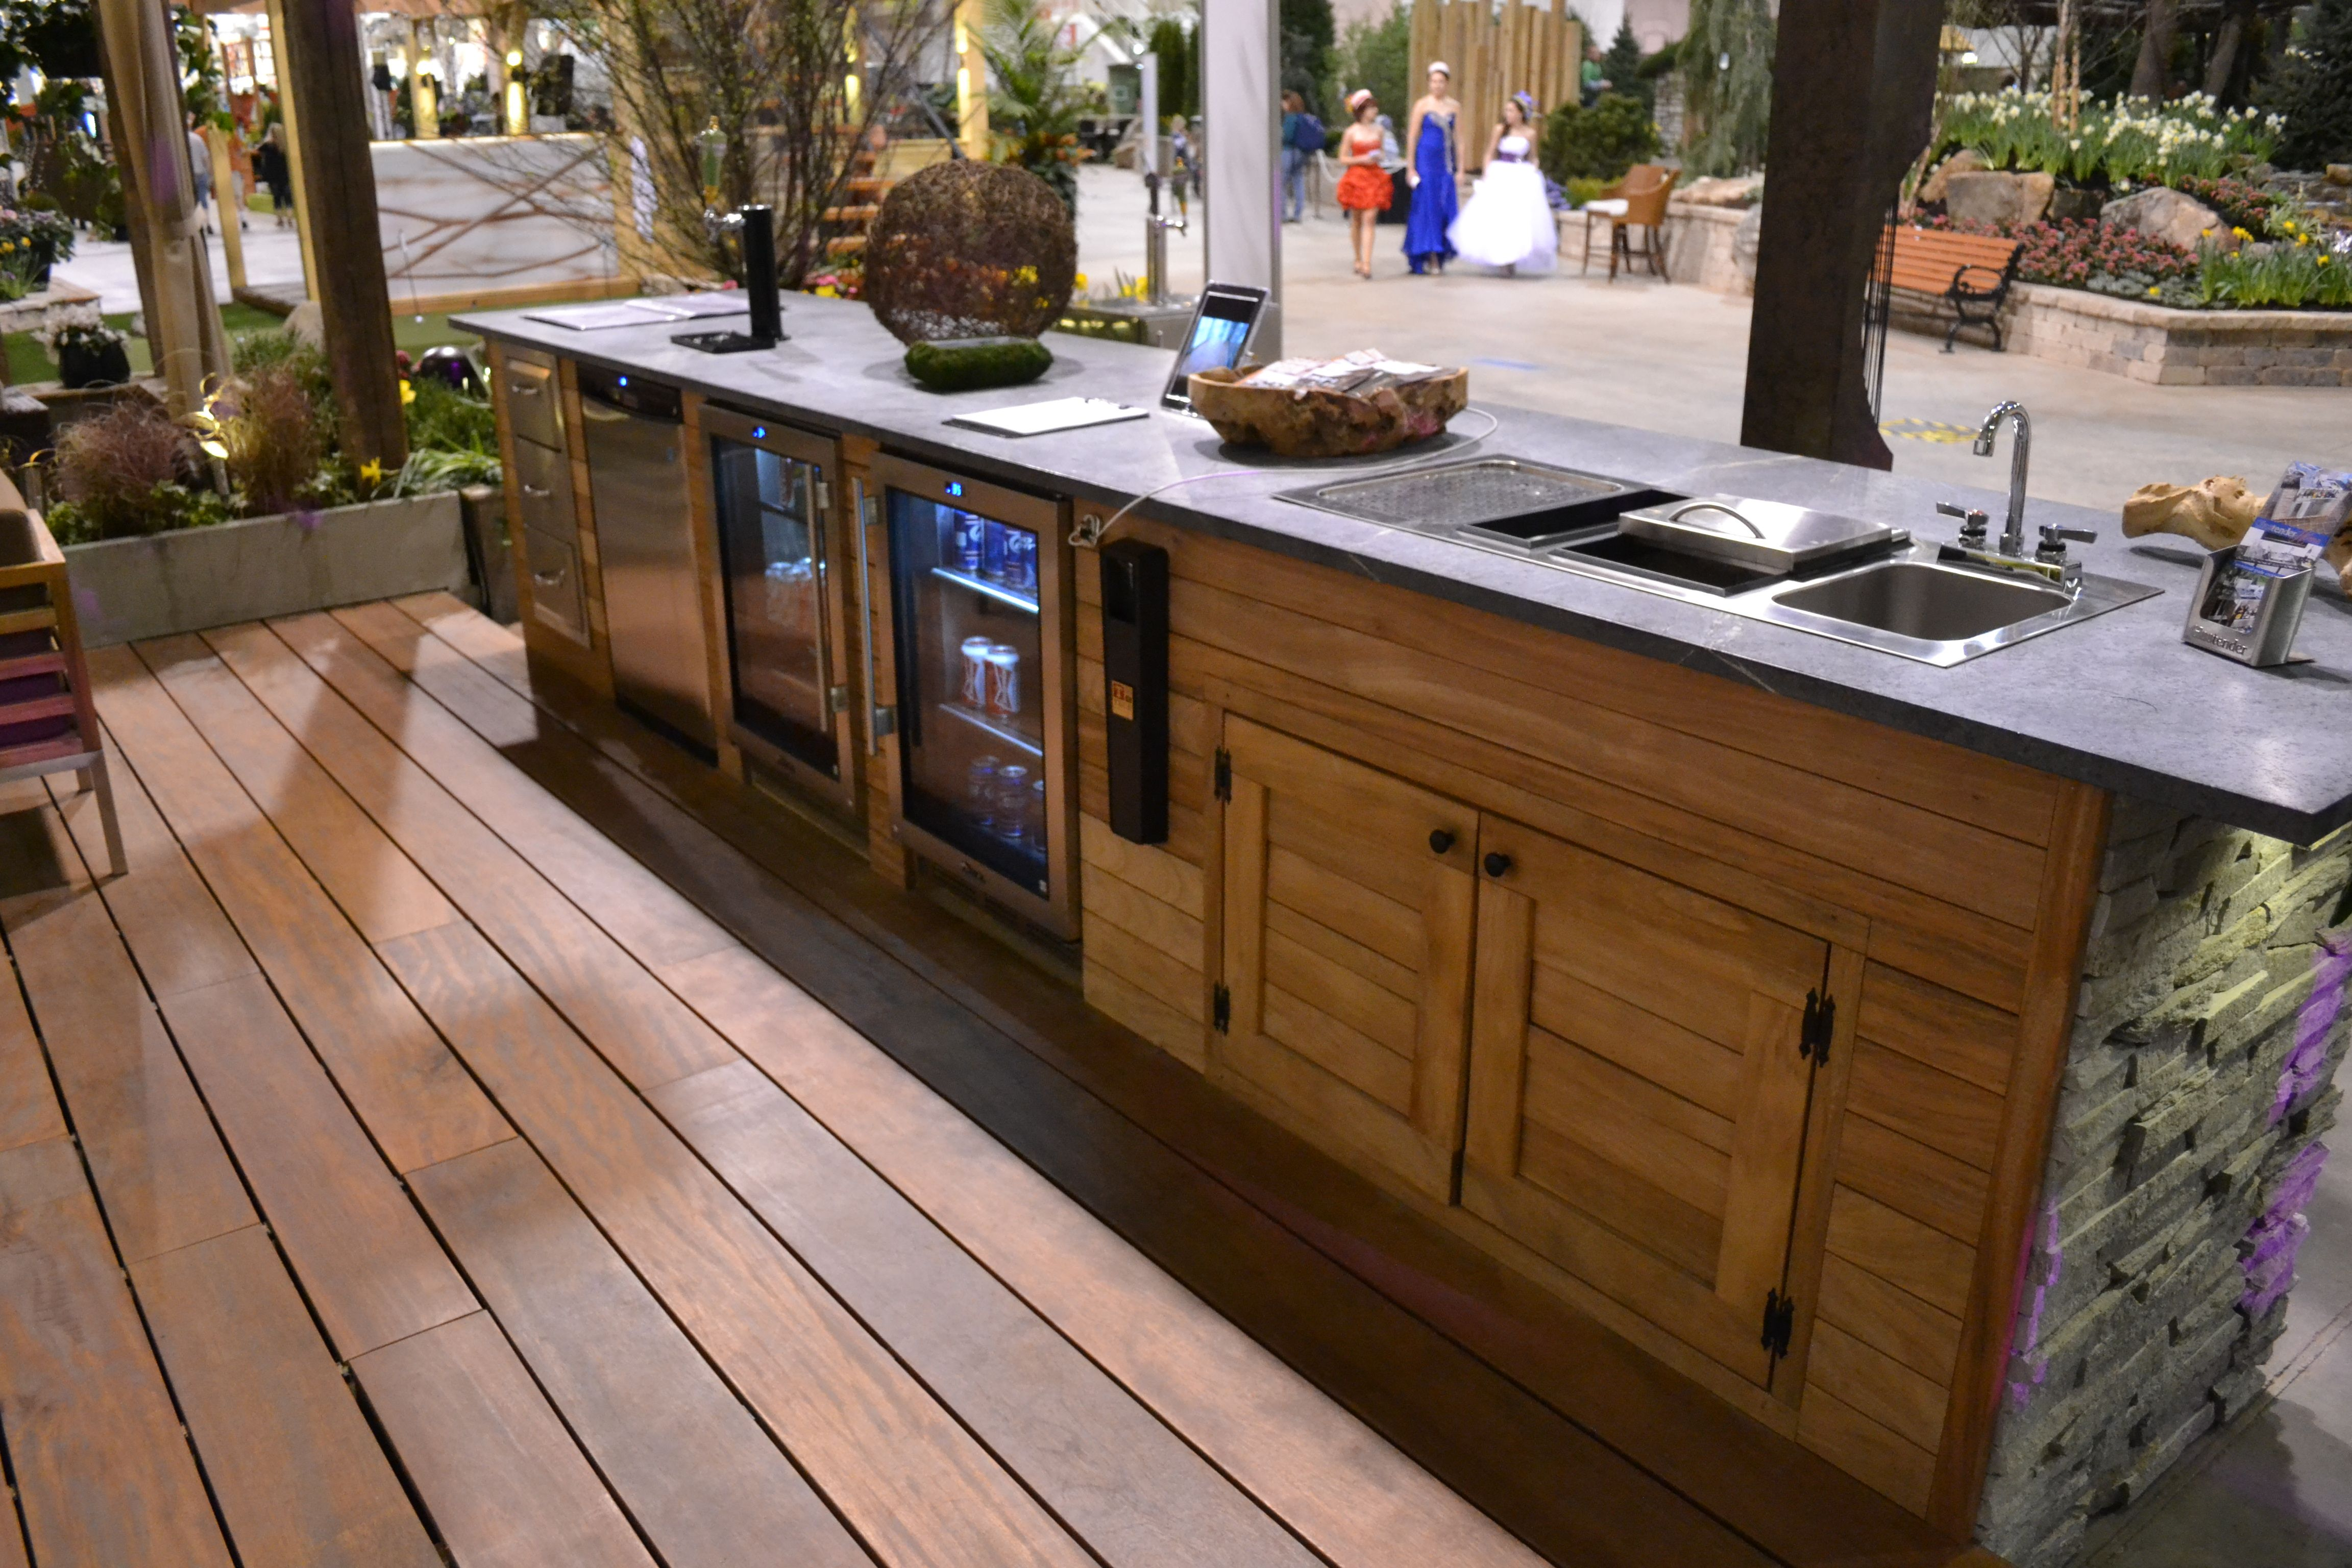 chicago outdoor kitchen glastender sink with condiment tray and ice bin true glass door re on outdoor kitchen kegerator id=83371